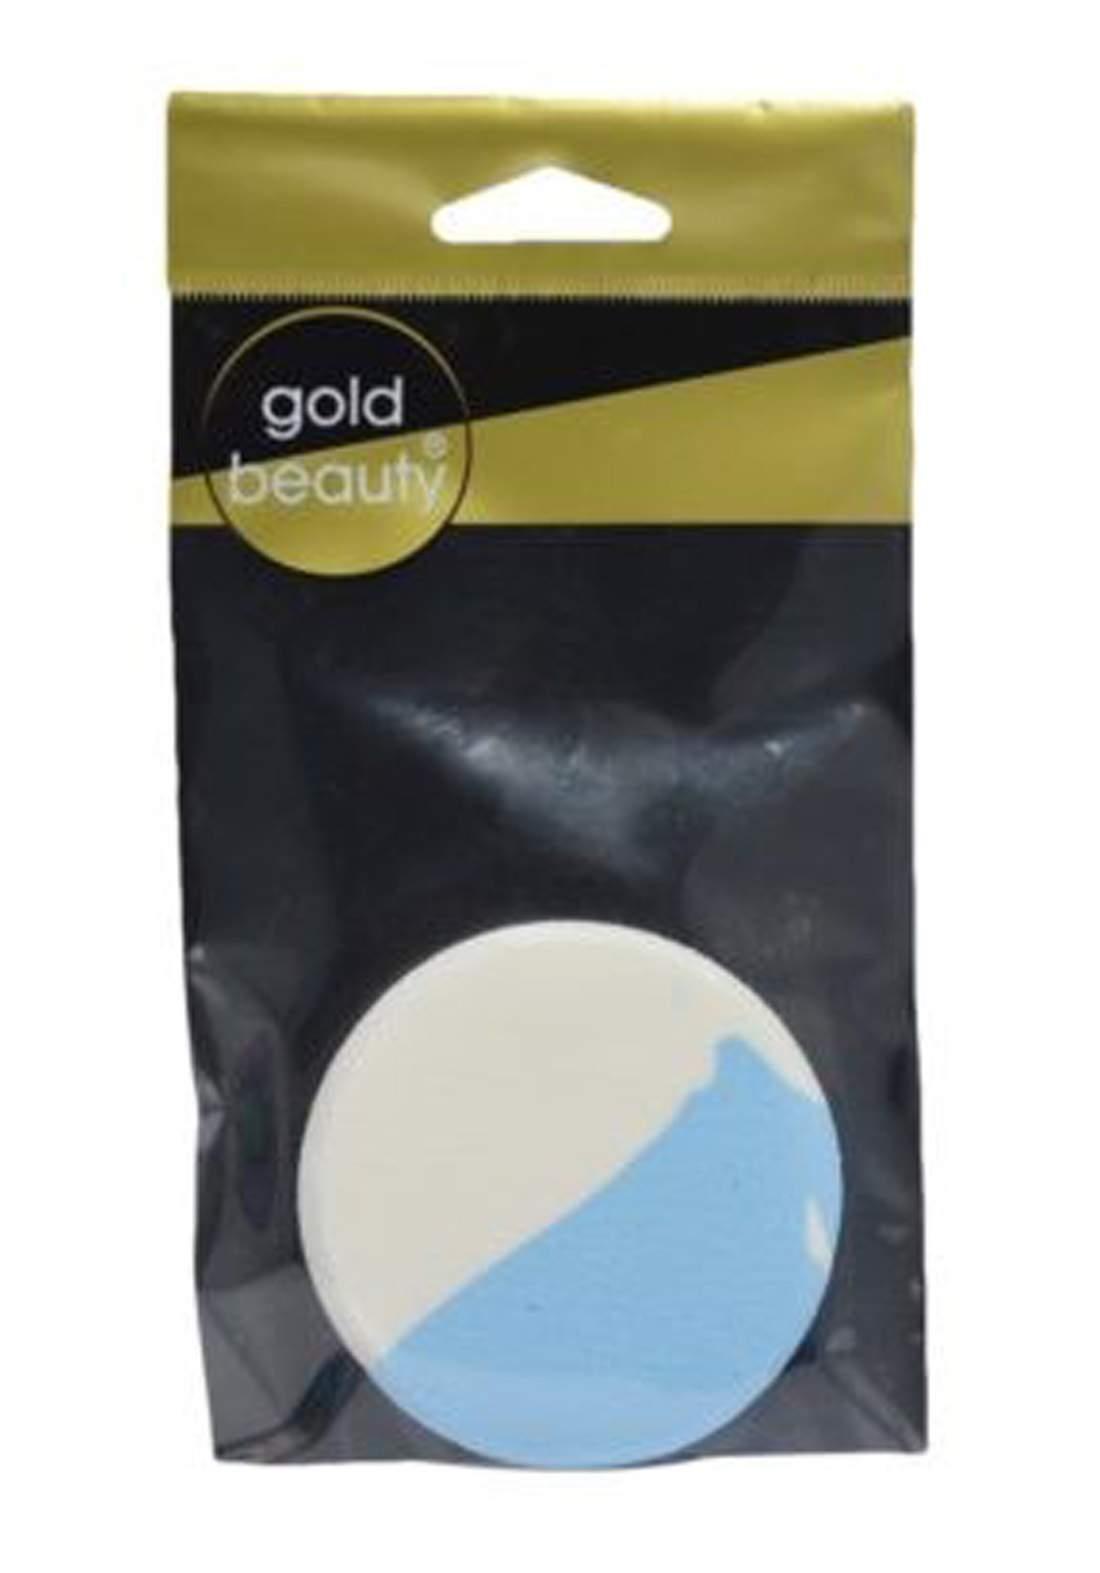 Gold Beauty  Ep1001 Makeup Powder Sponge  اسفنجة باودر